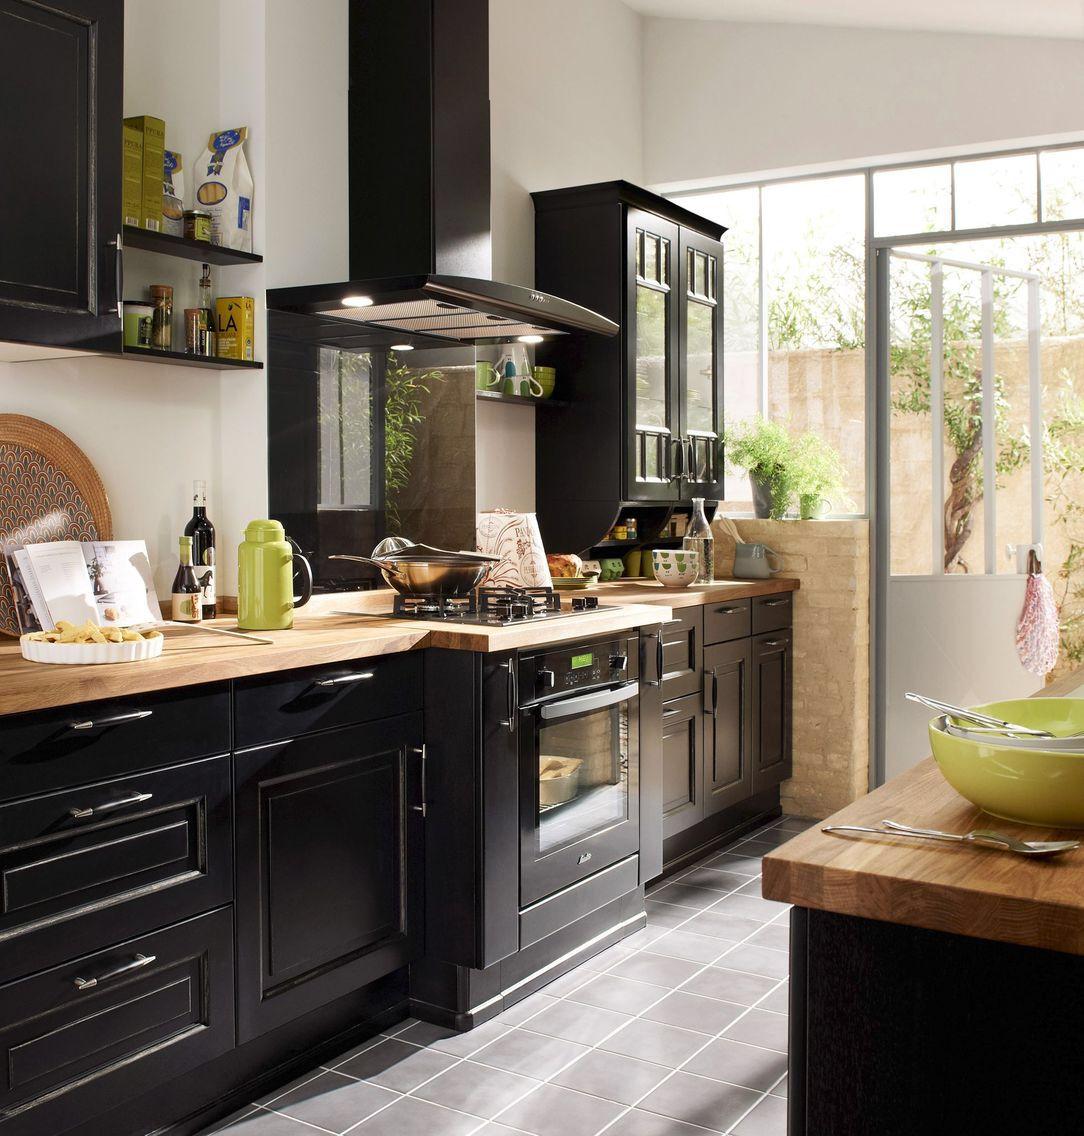 cuisine bistrot lapeyre darty aviva noire rouge pinterest esprit cuisines et cuisiner. Black Bedroom Furniture Sets. Home Design Ideas